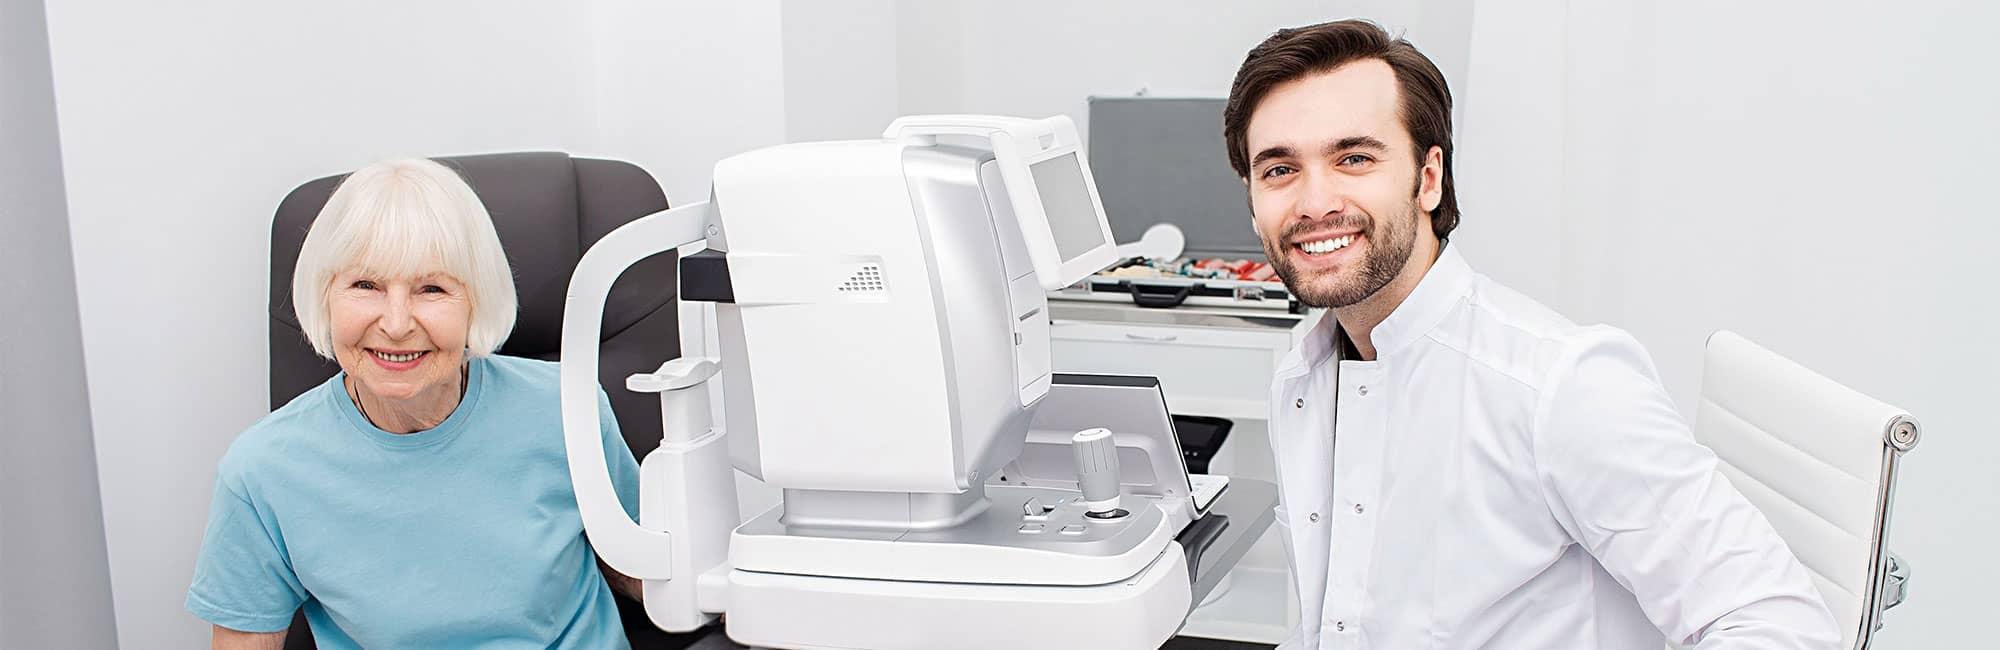 Smiling-Optometrist-low-vision-eye-exam-2000x650-1